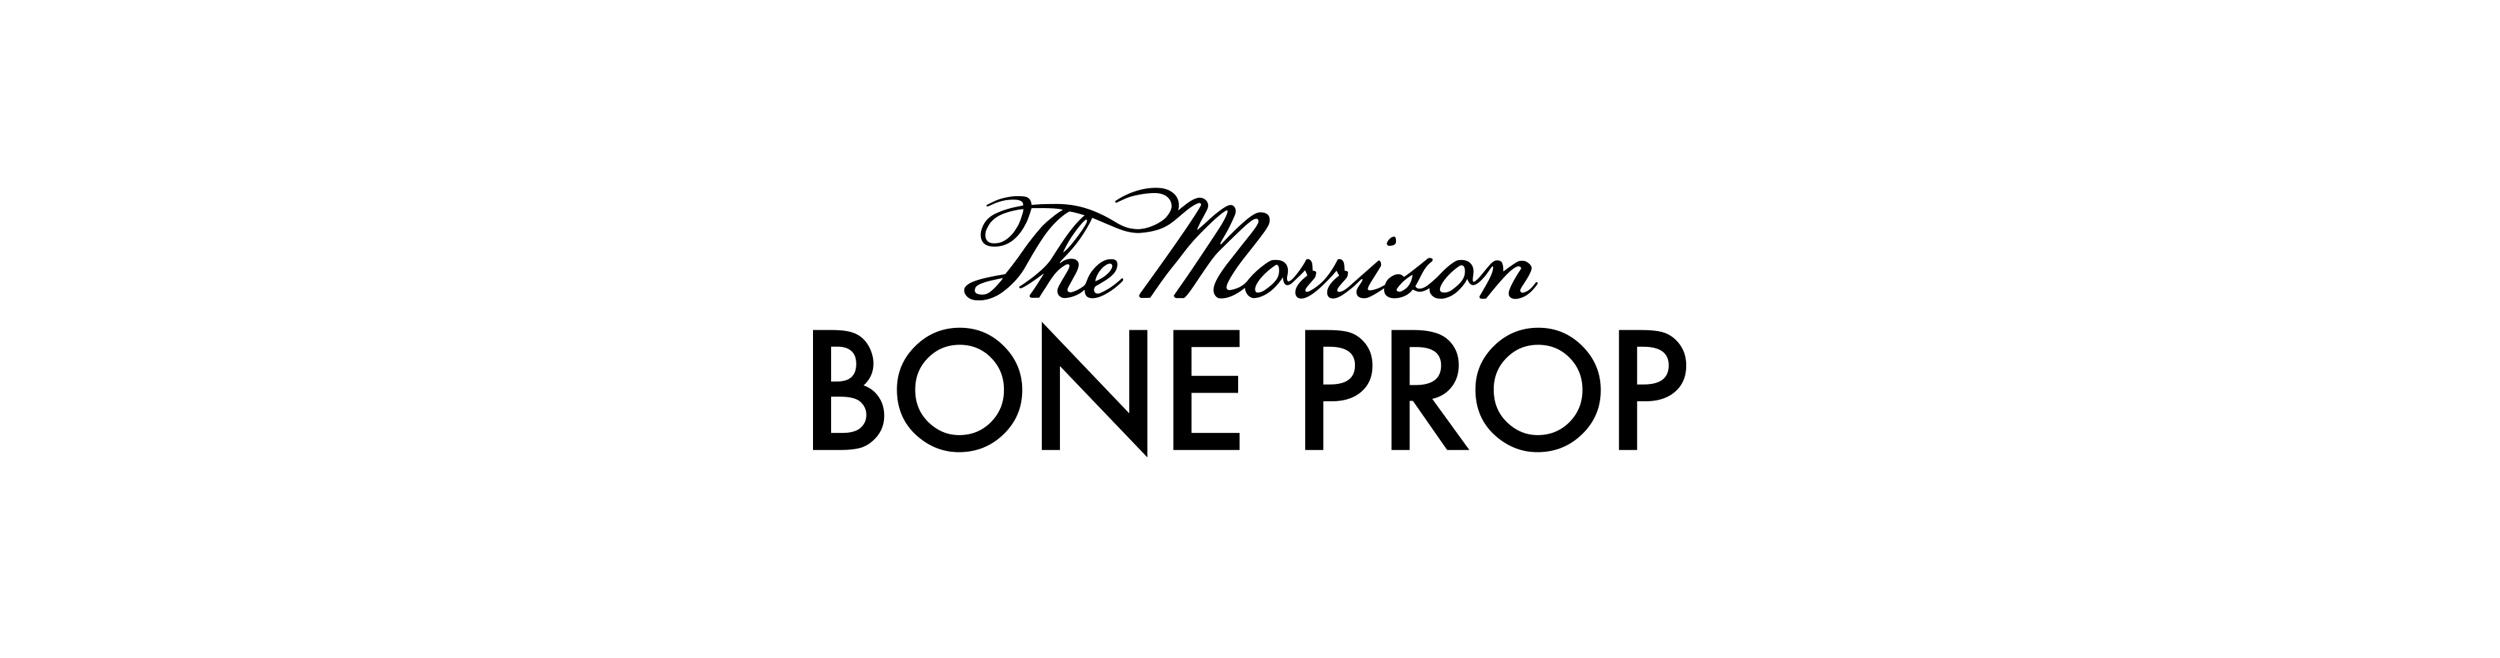 Charlotte_Willow_Retief_The_Morrison_Bone_Prop_Logo_BW.jpg